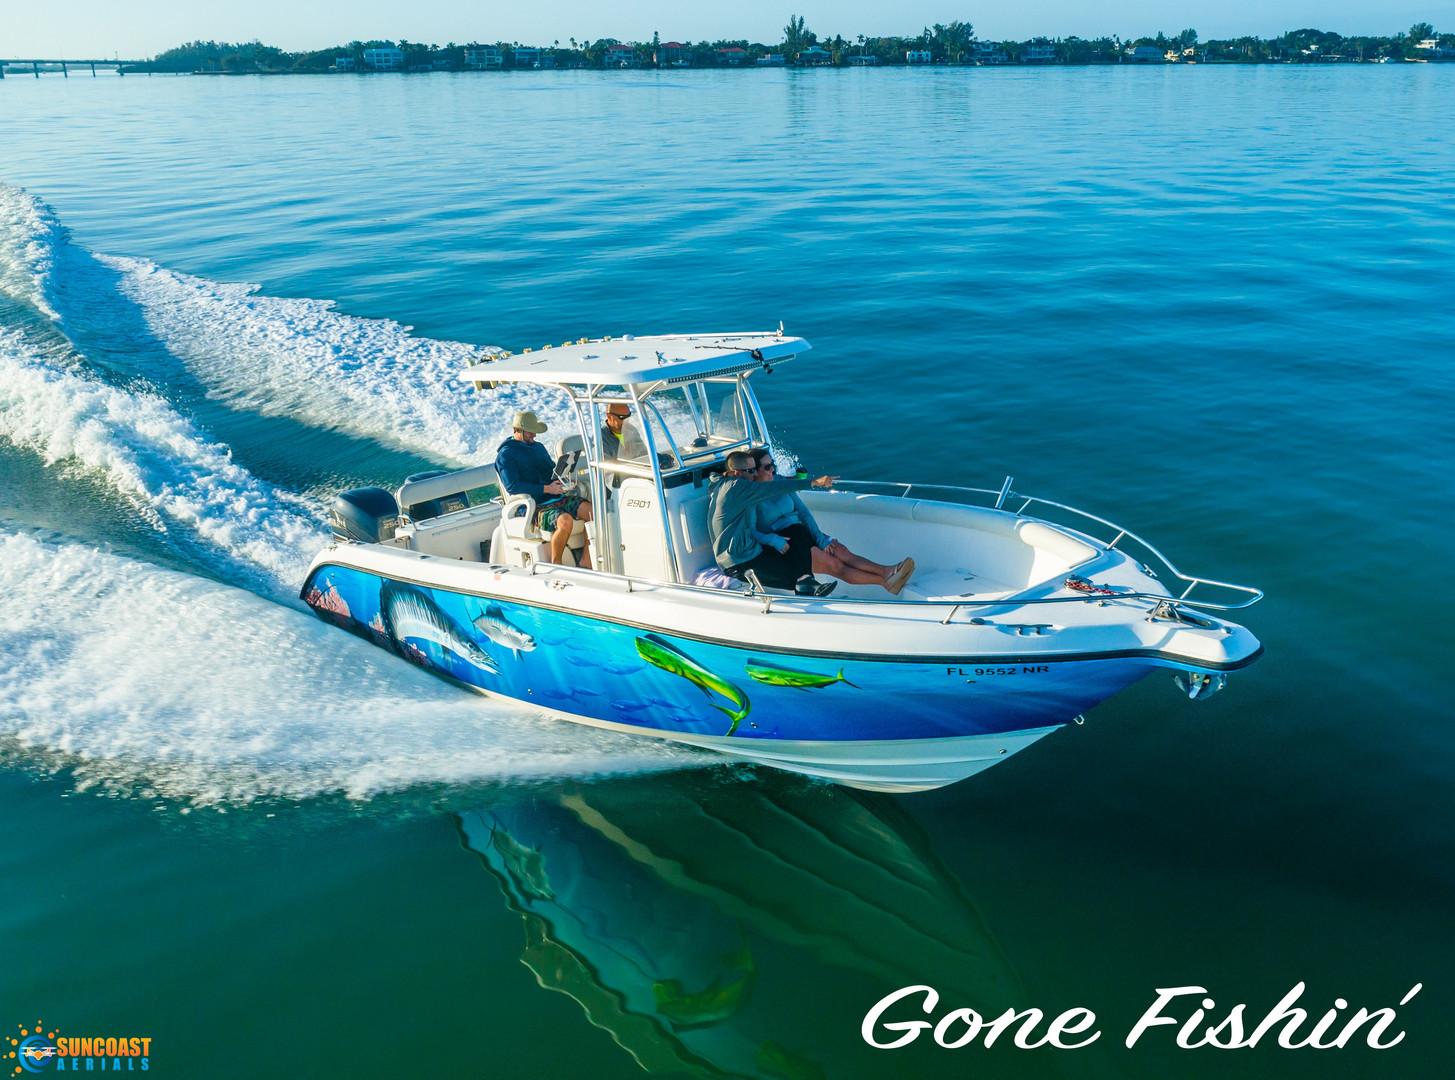 Rob's Boat Watermark Gone Fishin.jpg